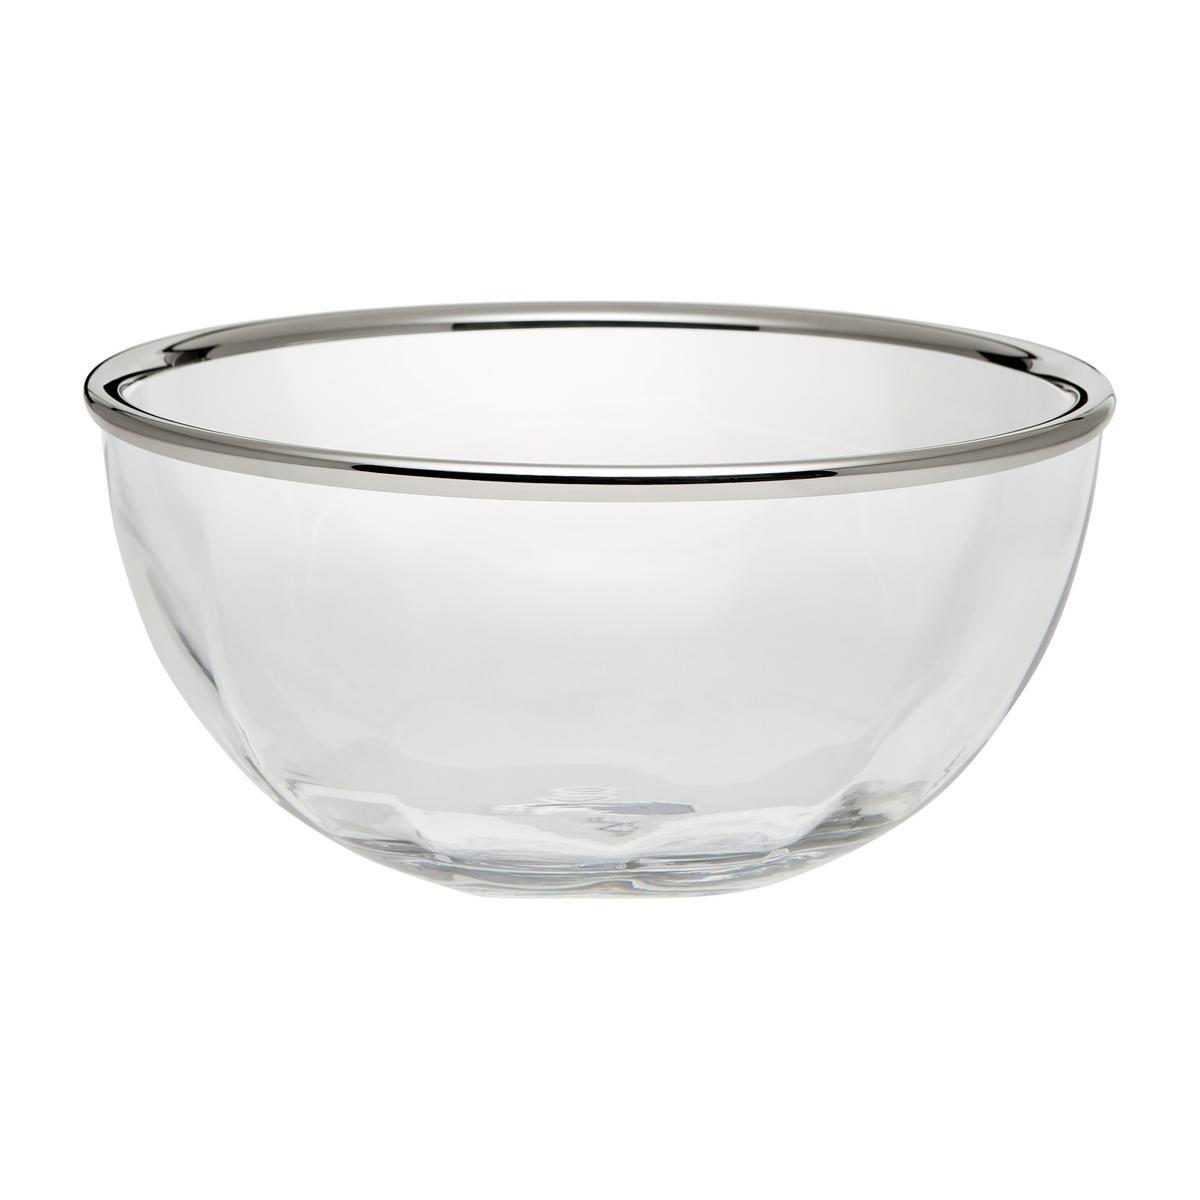 Ercuis Spirale Glass Bowls Artedona Com